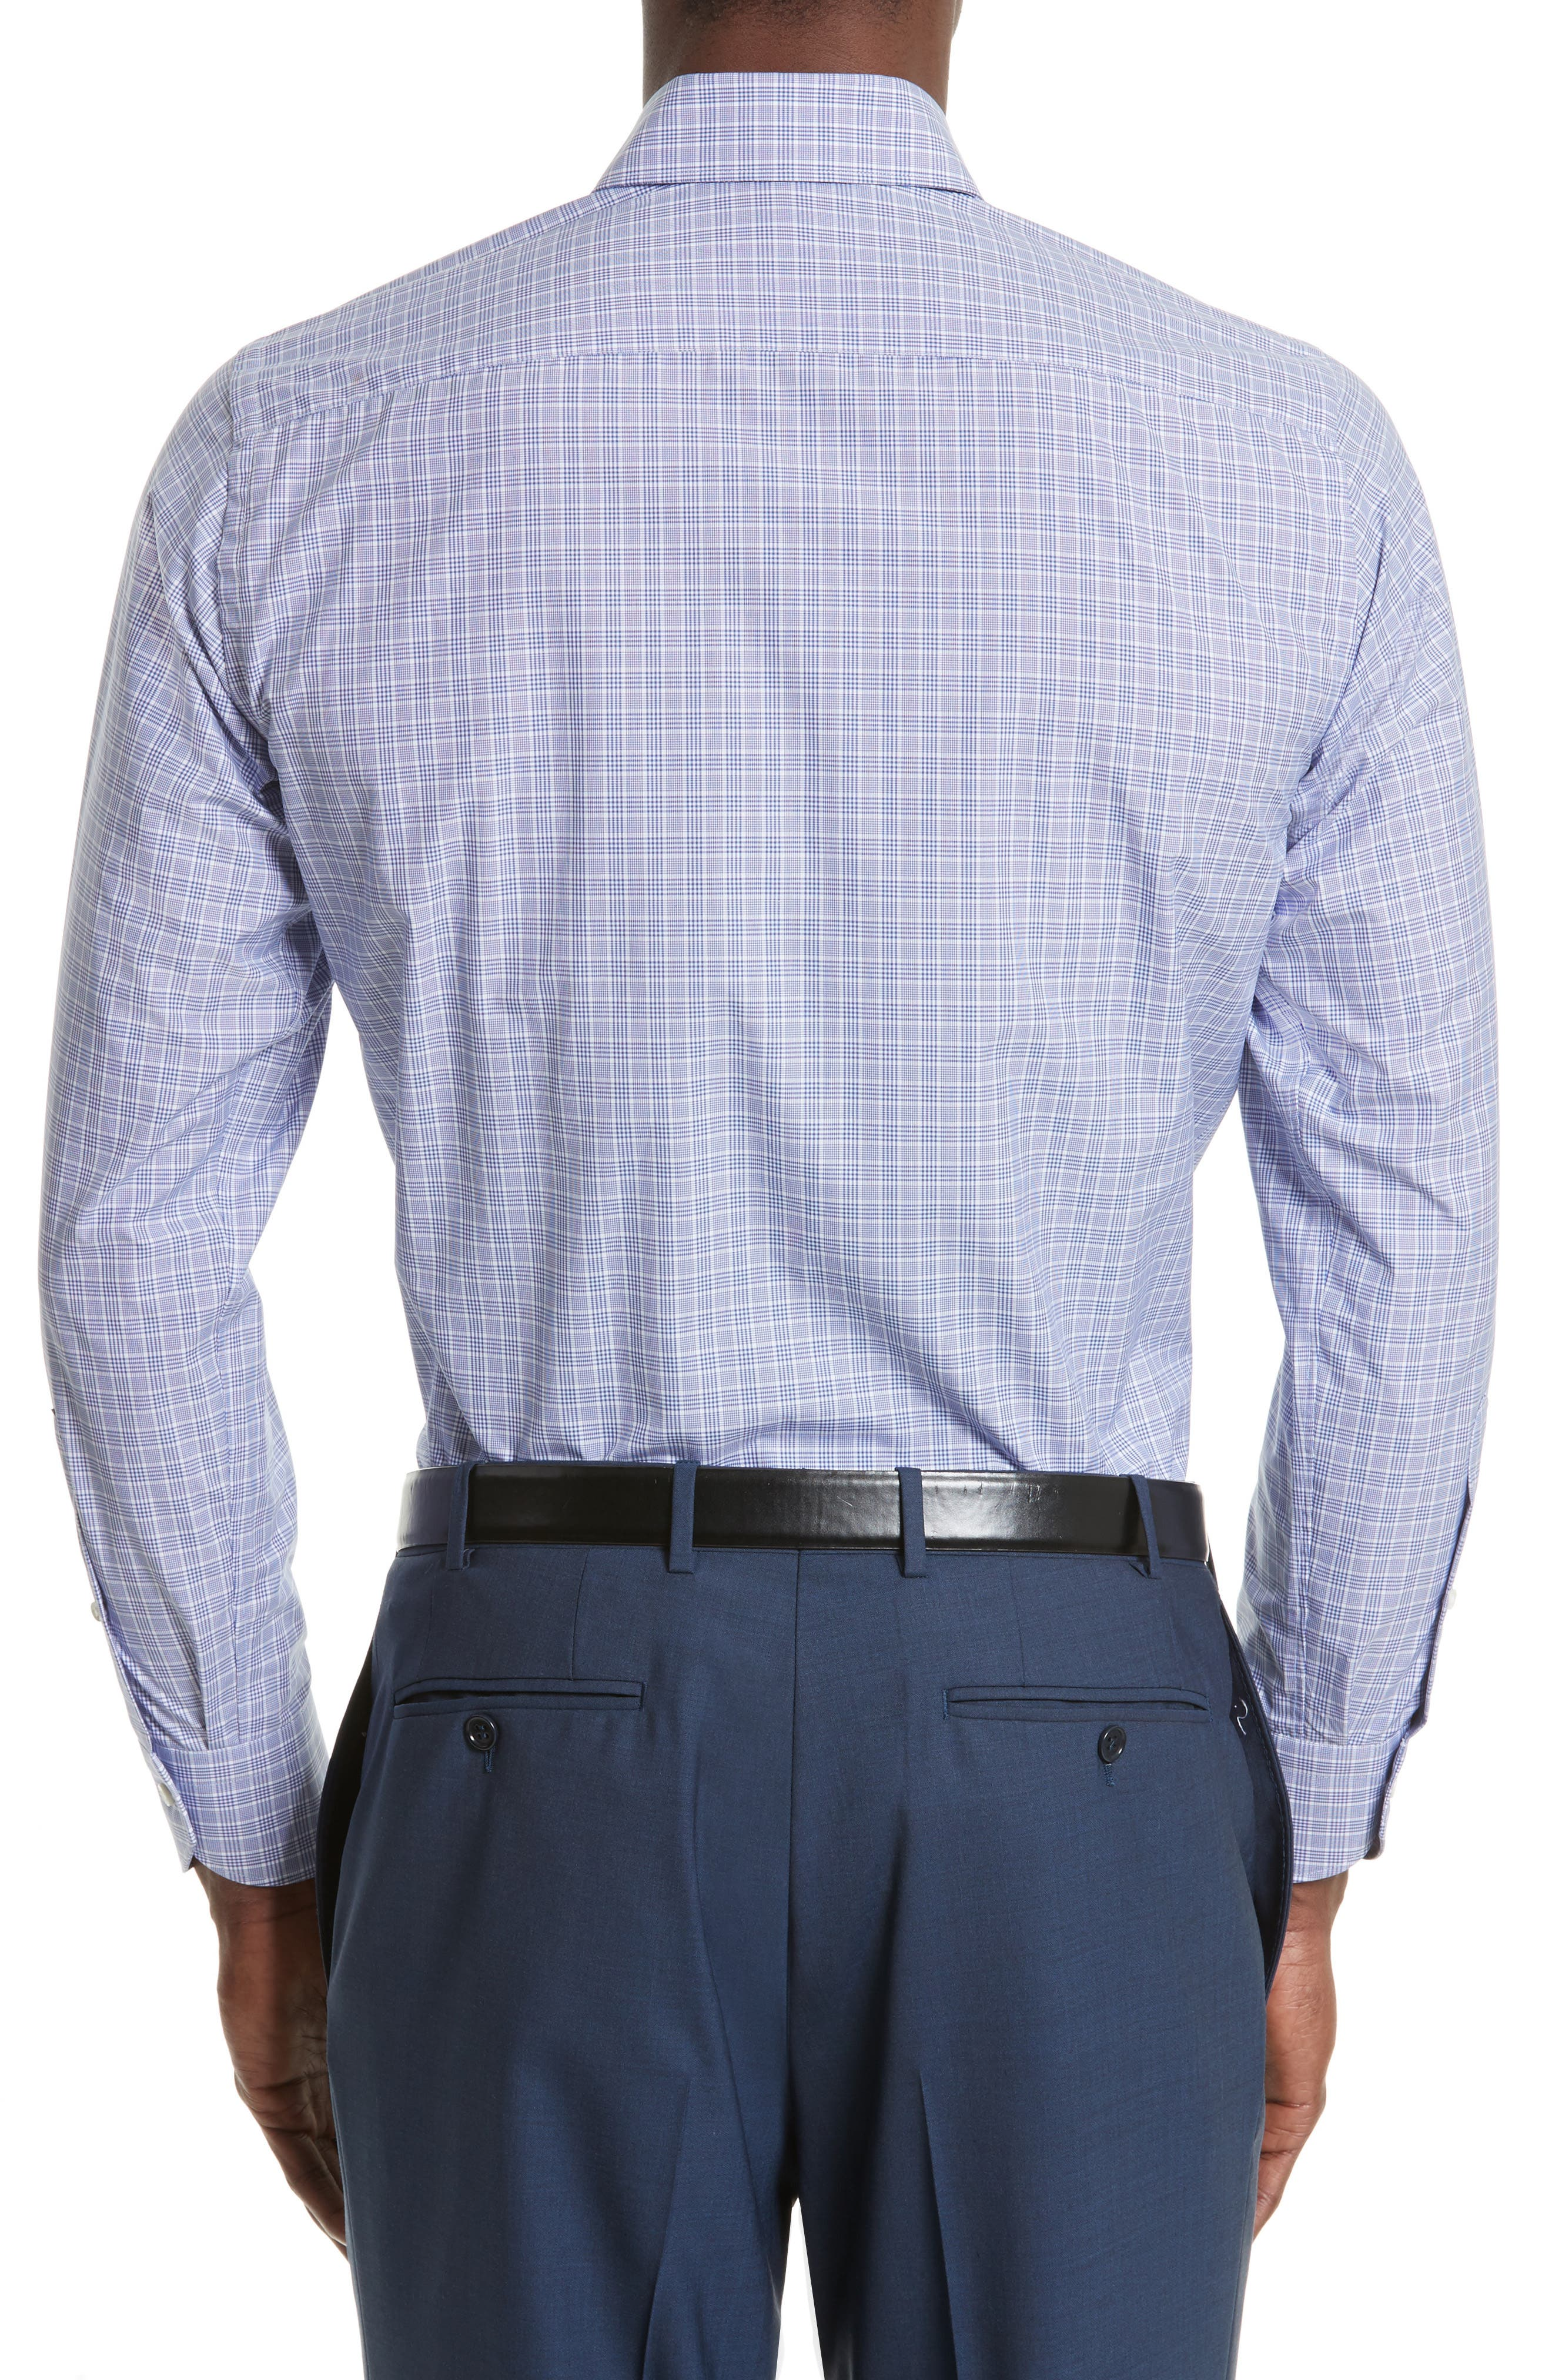 Alternate Image 3  - Canali Regular Fit Plaid Dress Shirt